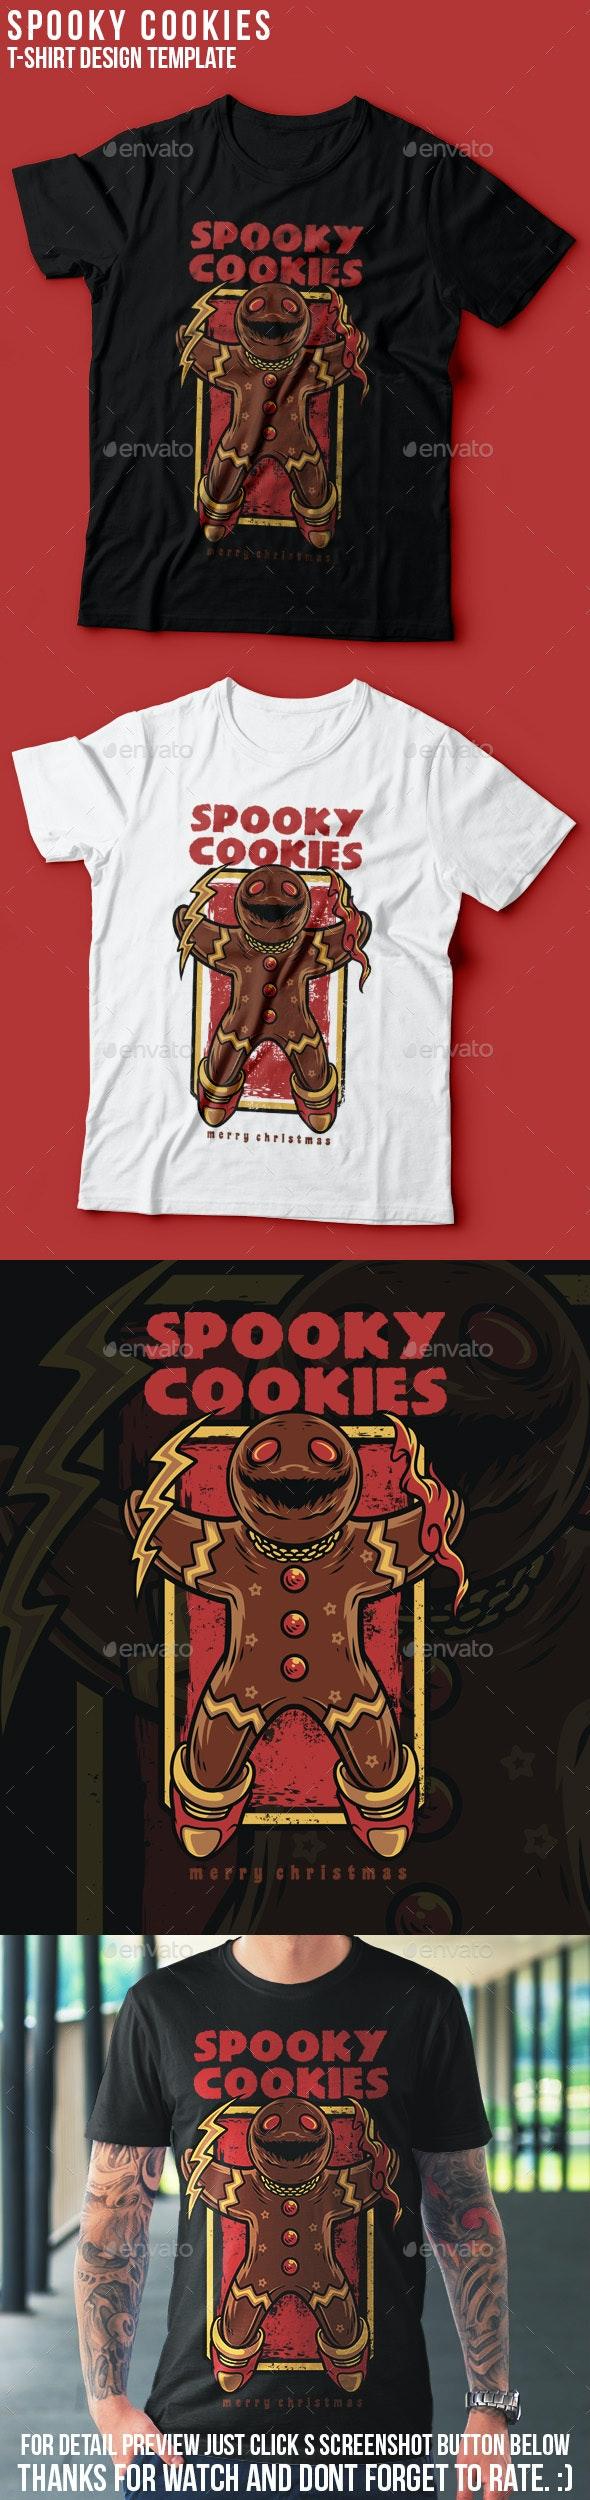 Spooky Cookies Happy Christmas T-Shirt Design - Grunge Designs